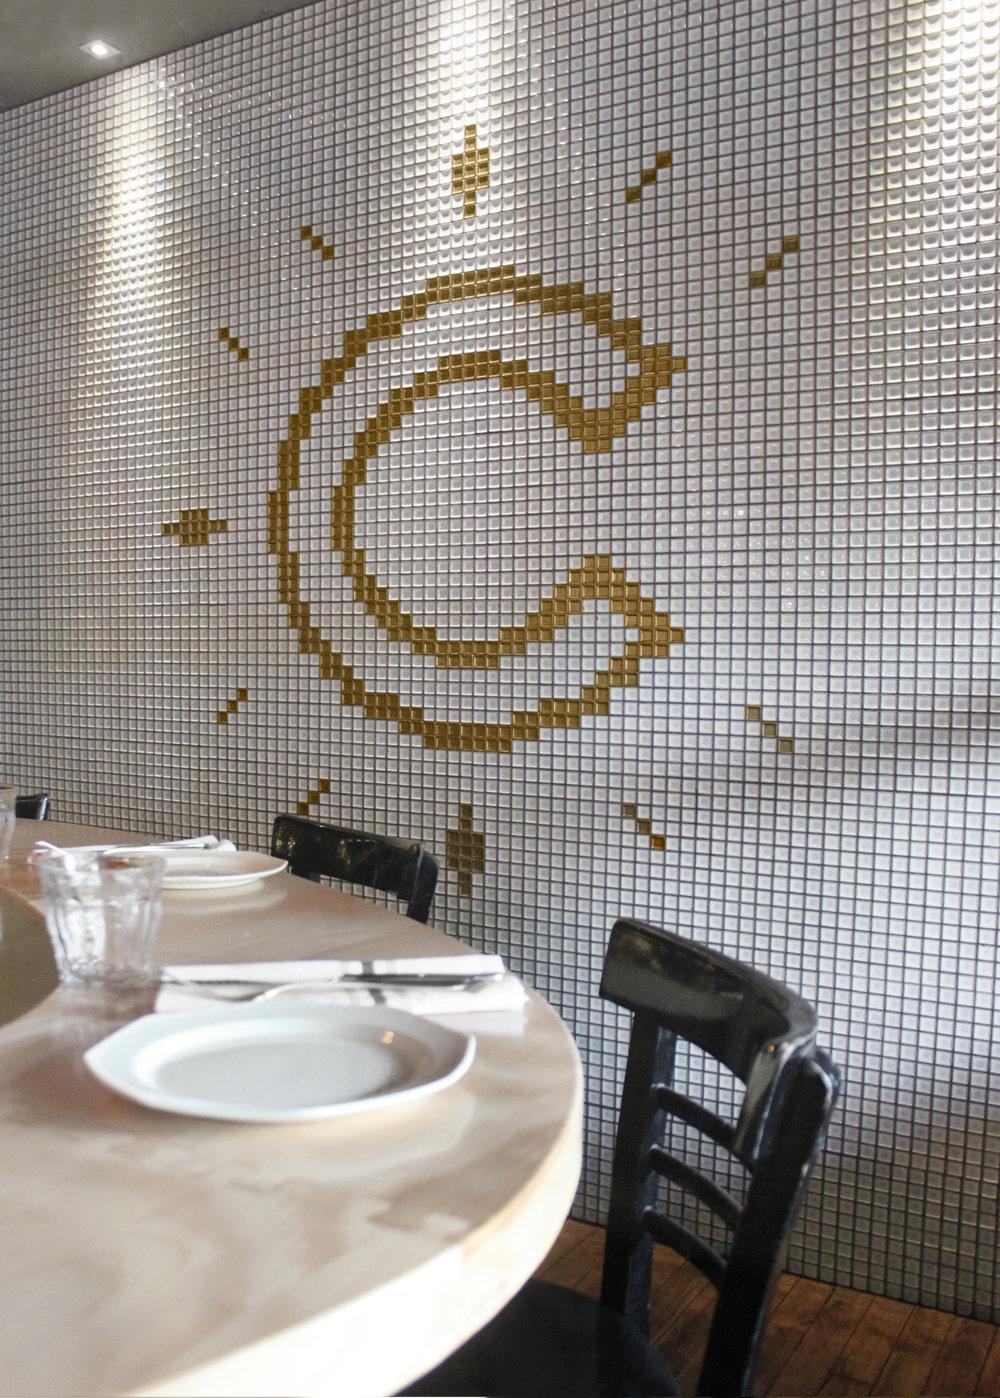 Figure-Jeremy-Hall-Design-Graphique-Logo-Branding-Image-De-Marque-Cendrillon-Restaurant-Design-Espace-Commercial-24.jpg